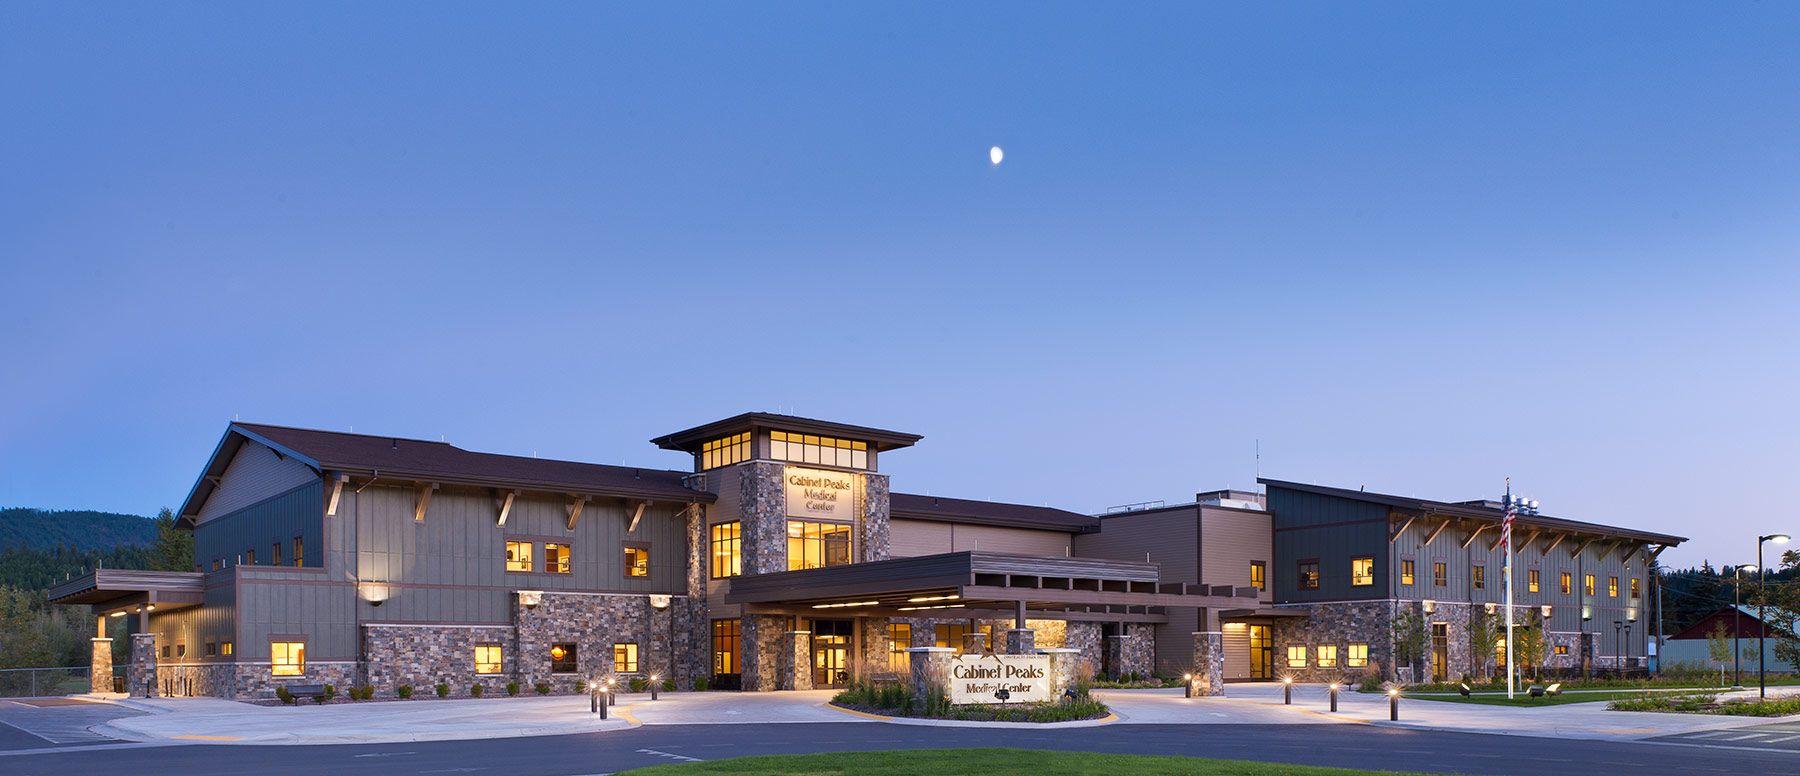 Cabinet Peaks Hospital, Libby, MT